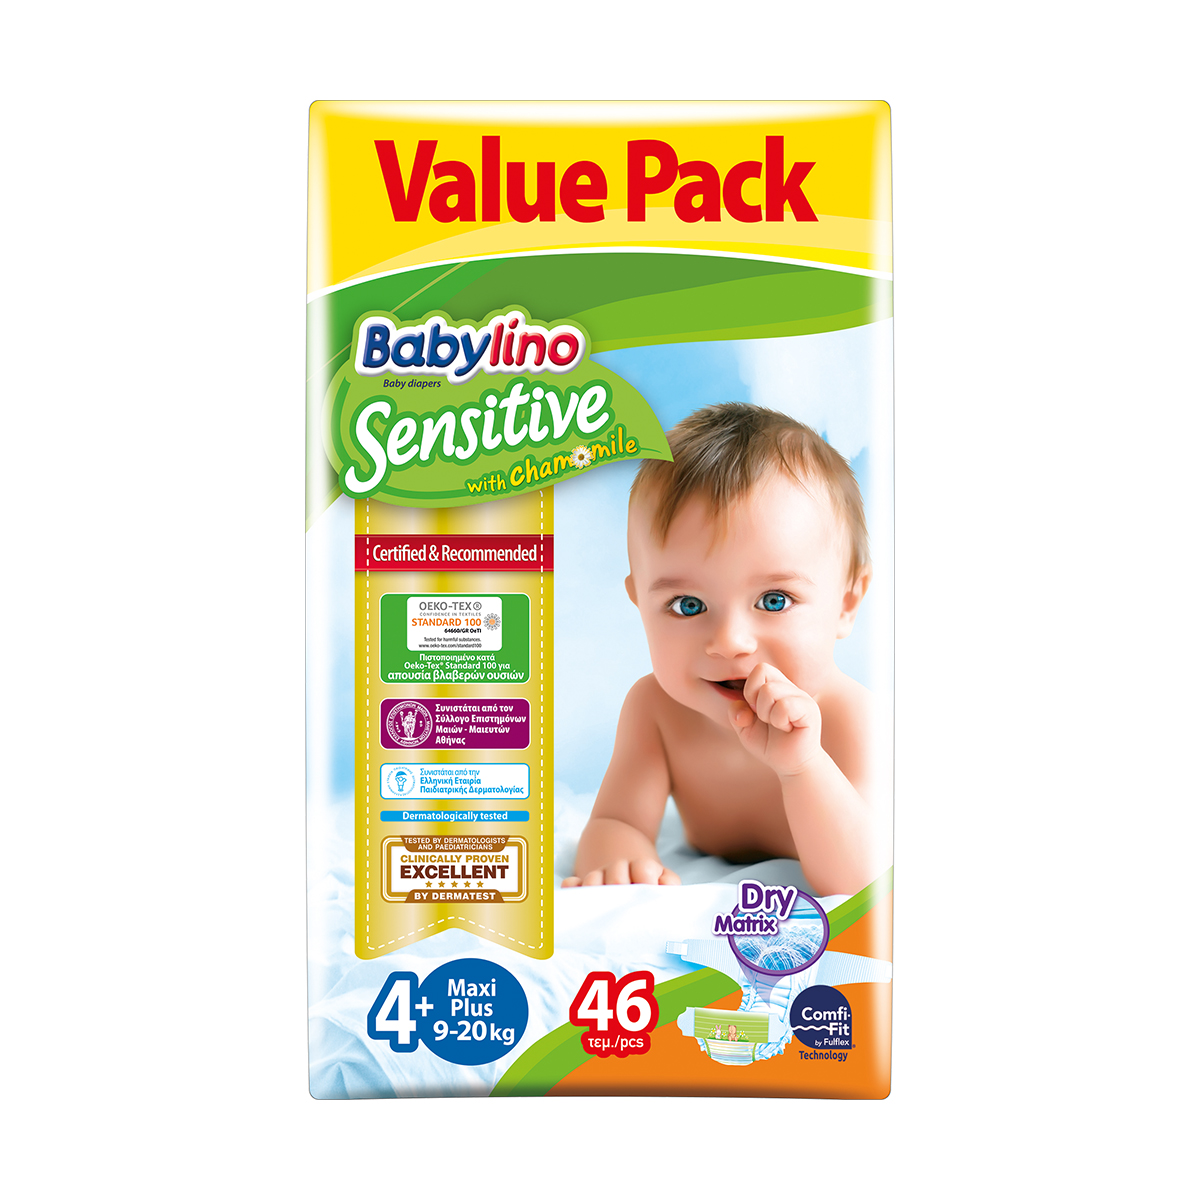 Scutece Babylino Sensitive Economy, N4+, 9-20 kg, 46 Buc.